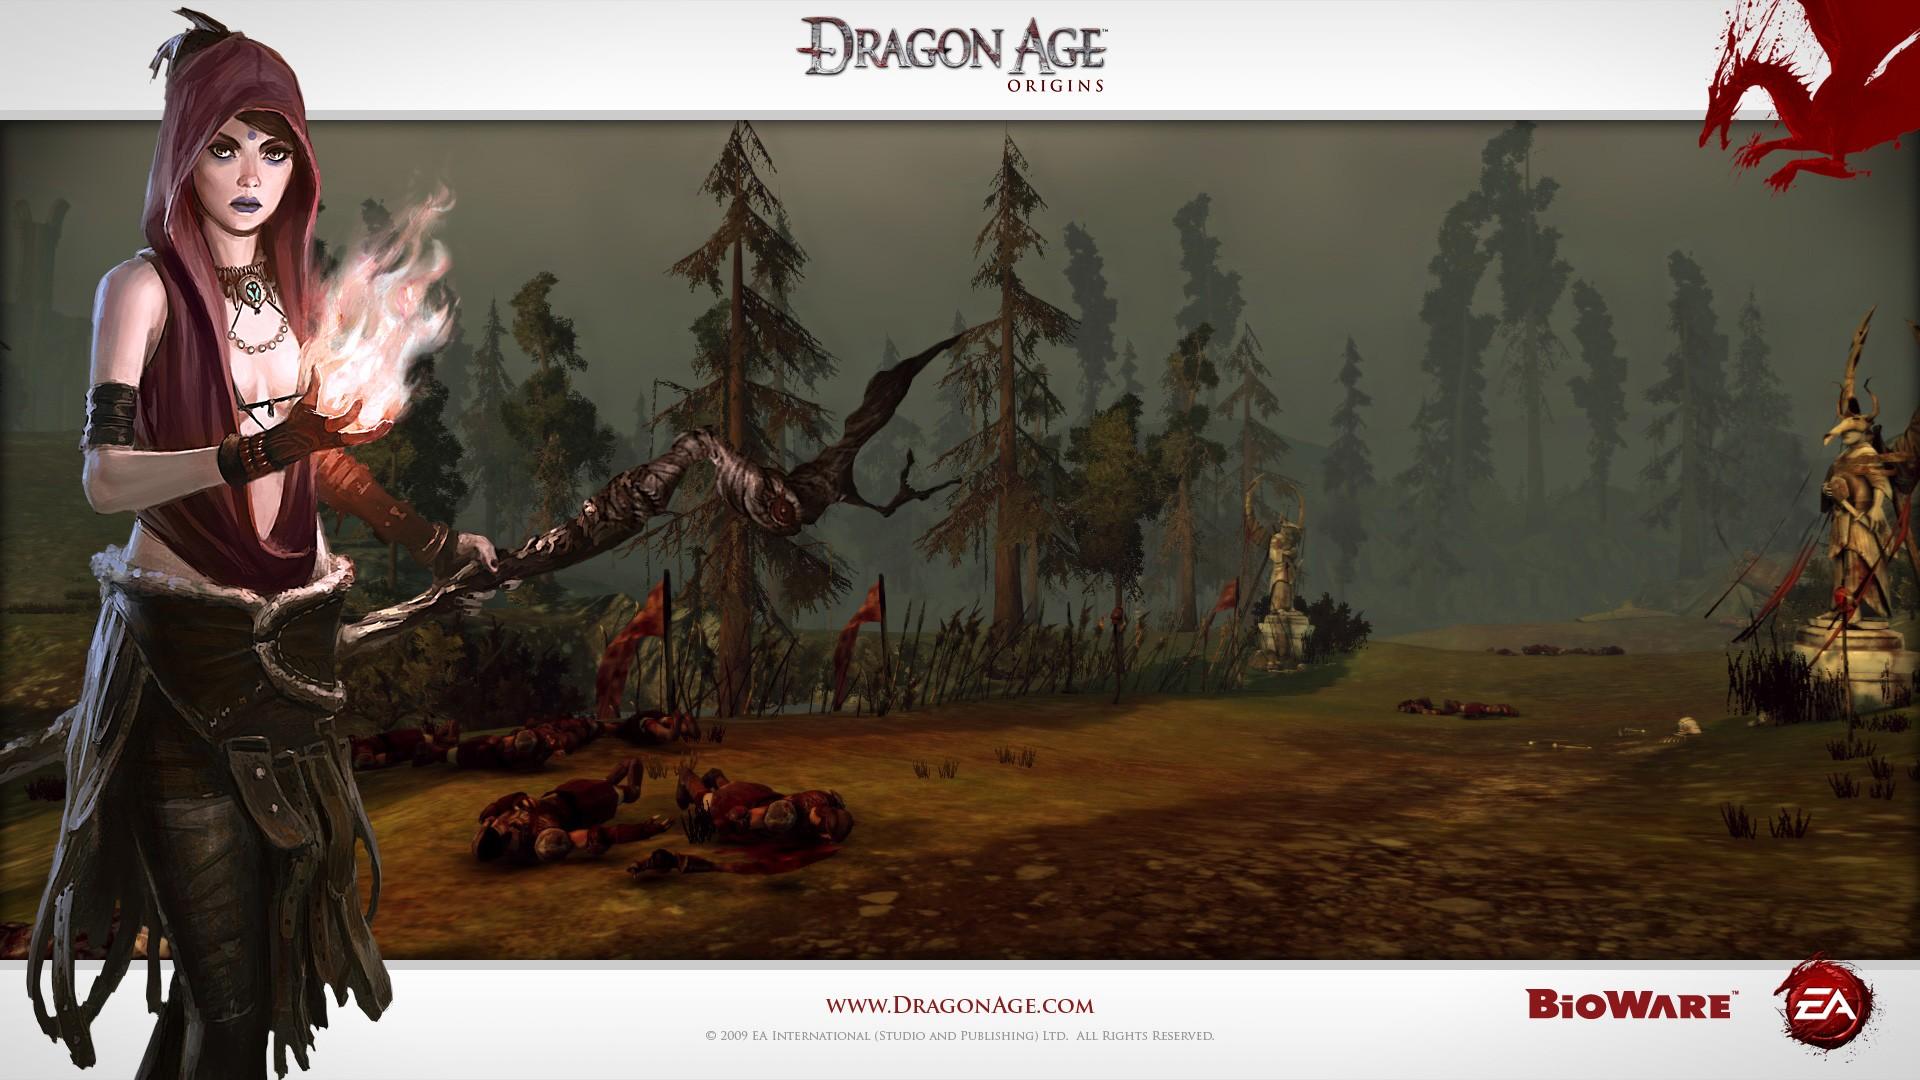 Wallpaper Video Games Dragon Age Mythology Dragon Age Origins